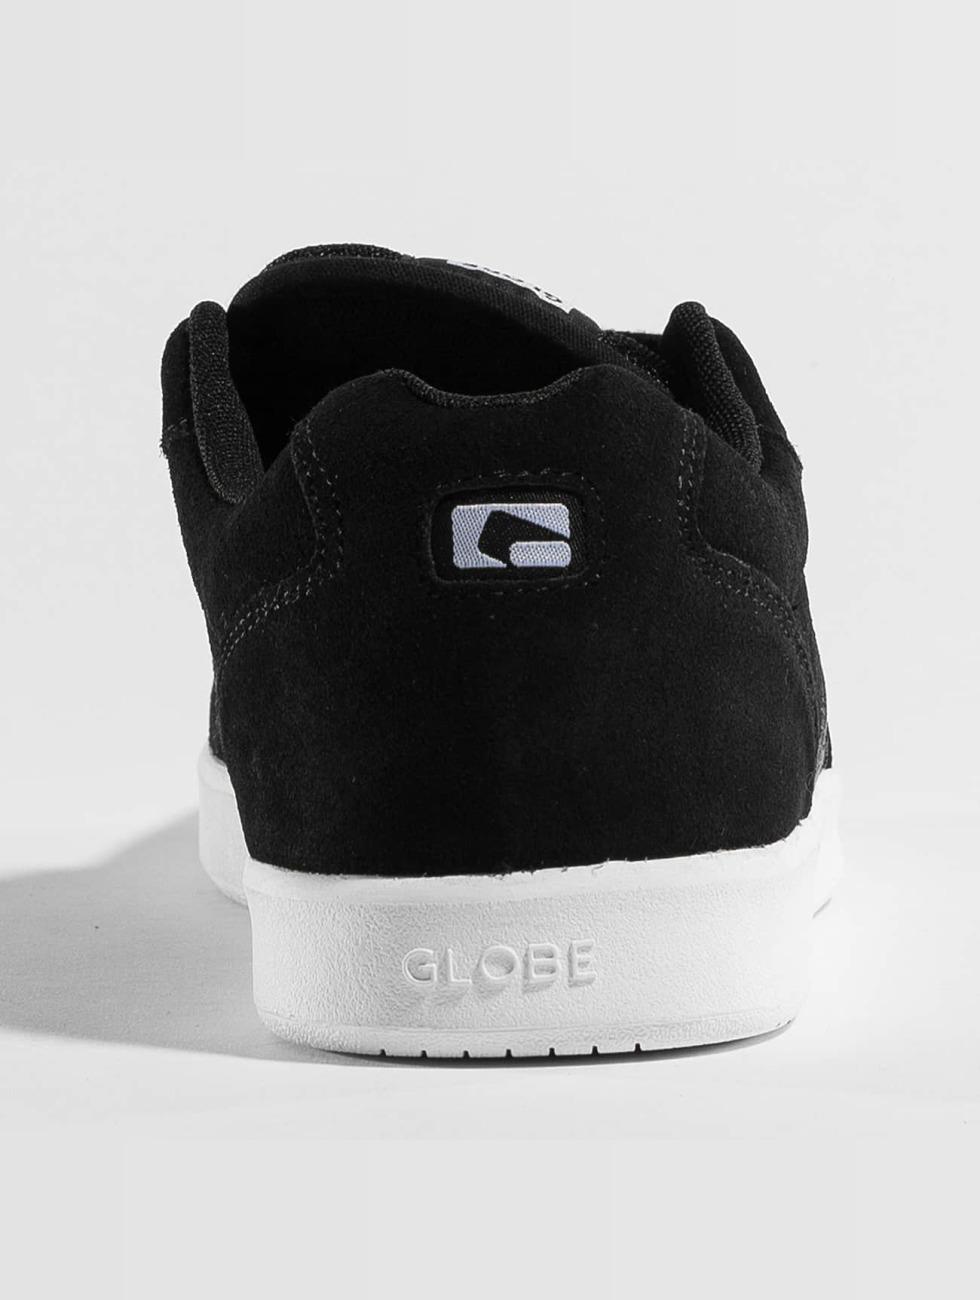 Globe Sneakers Octave black